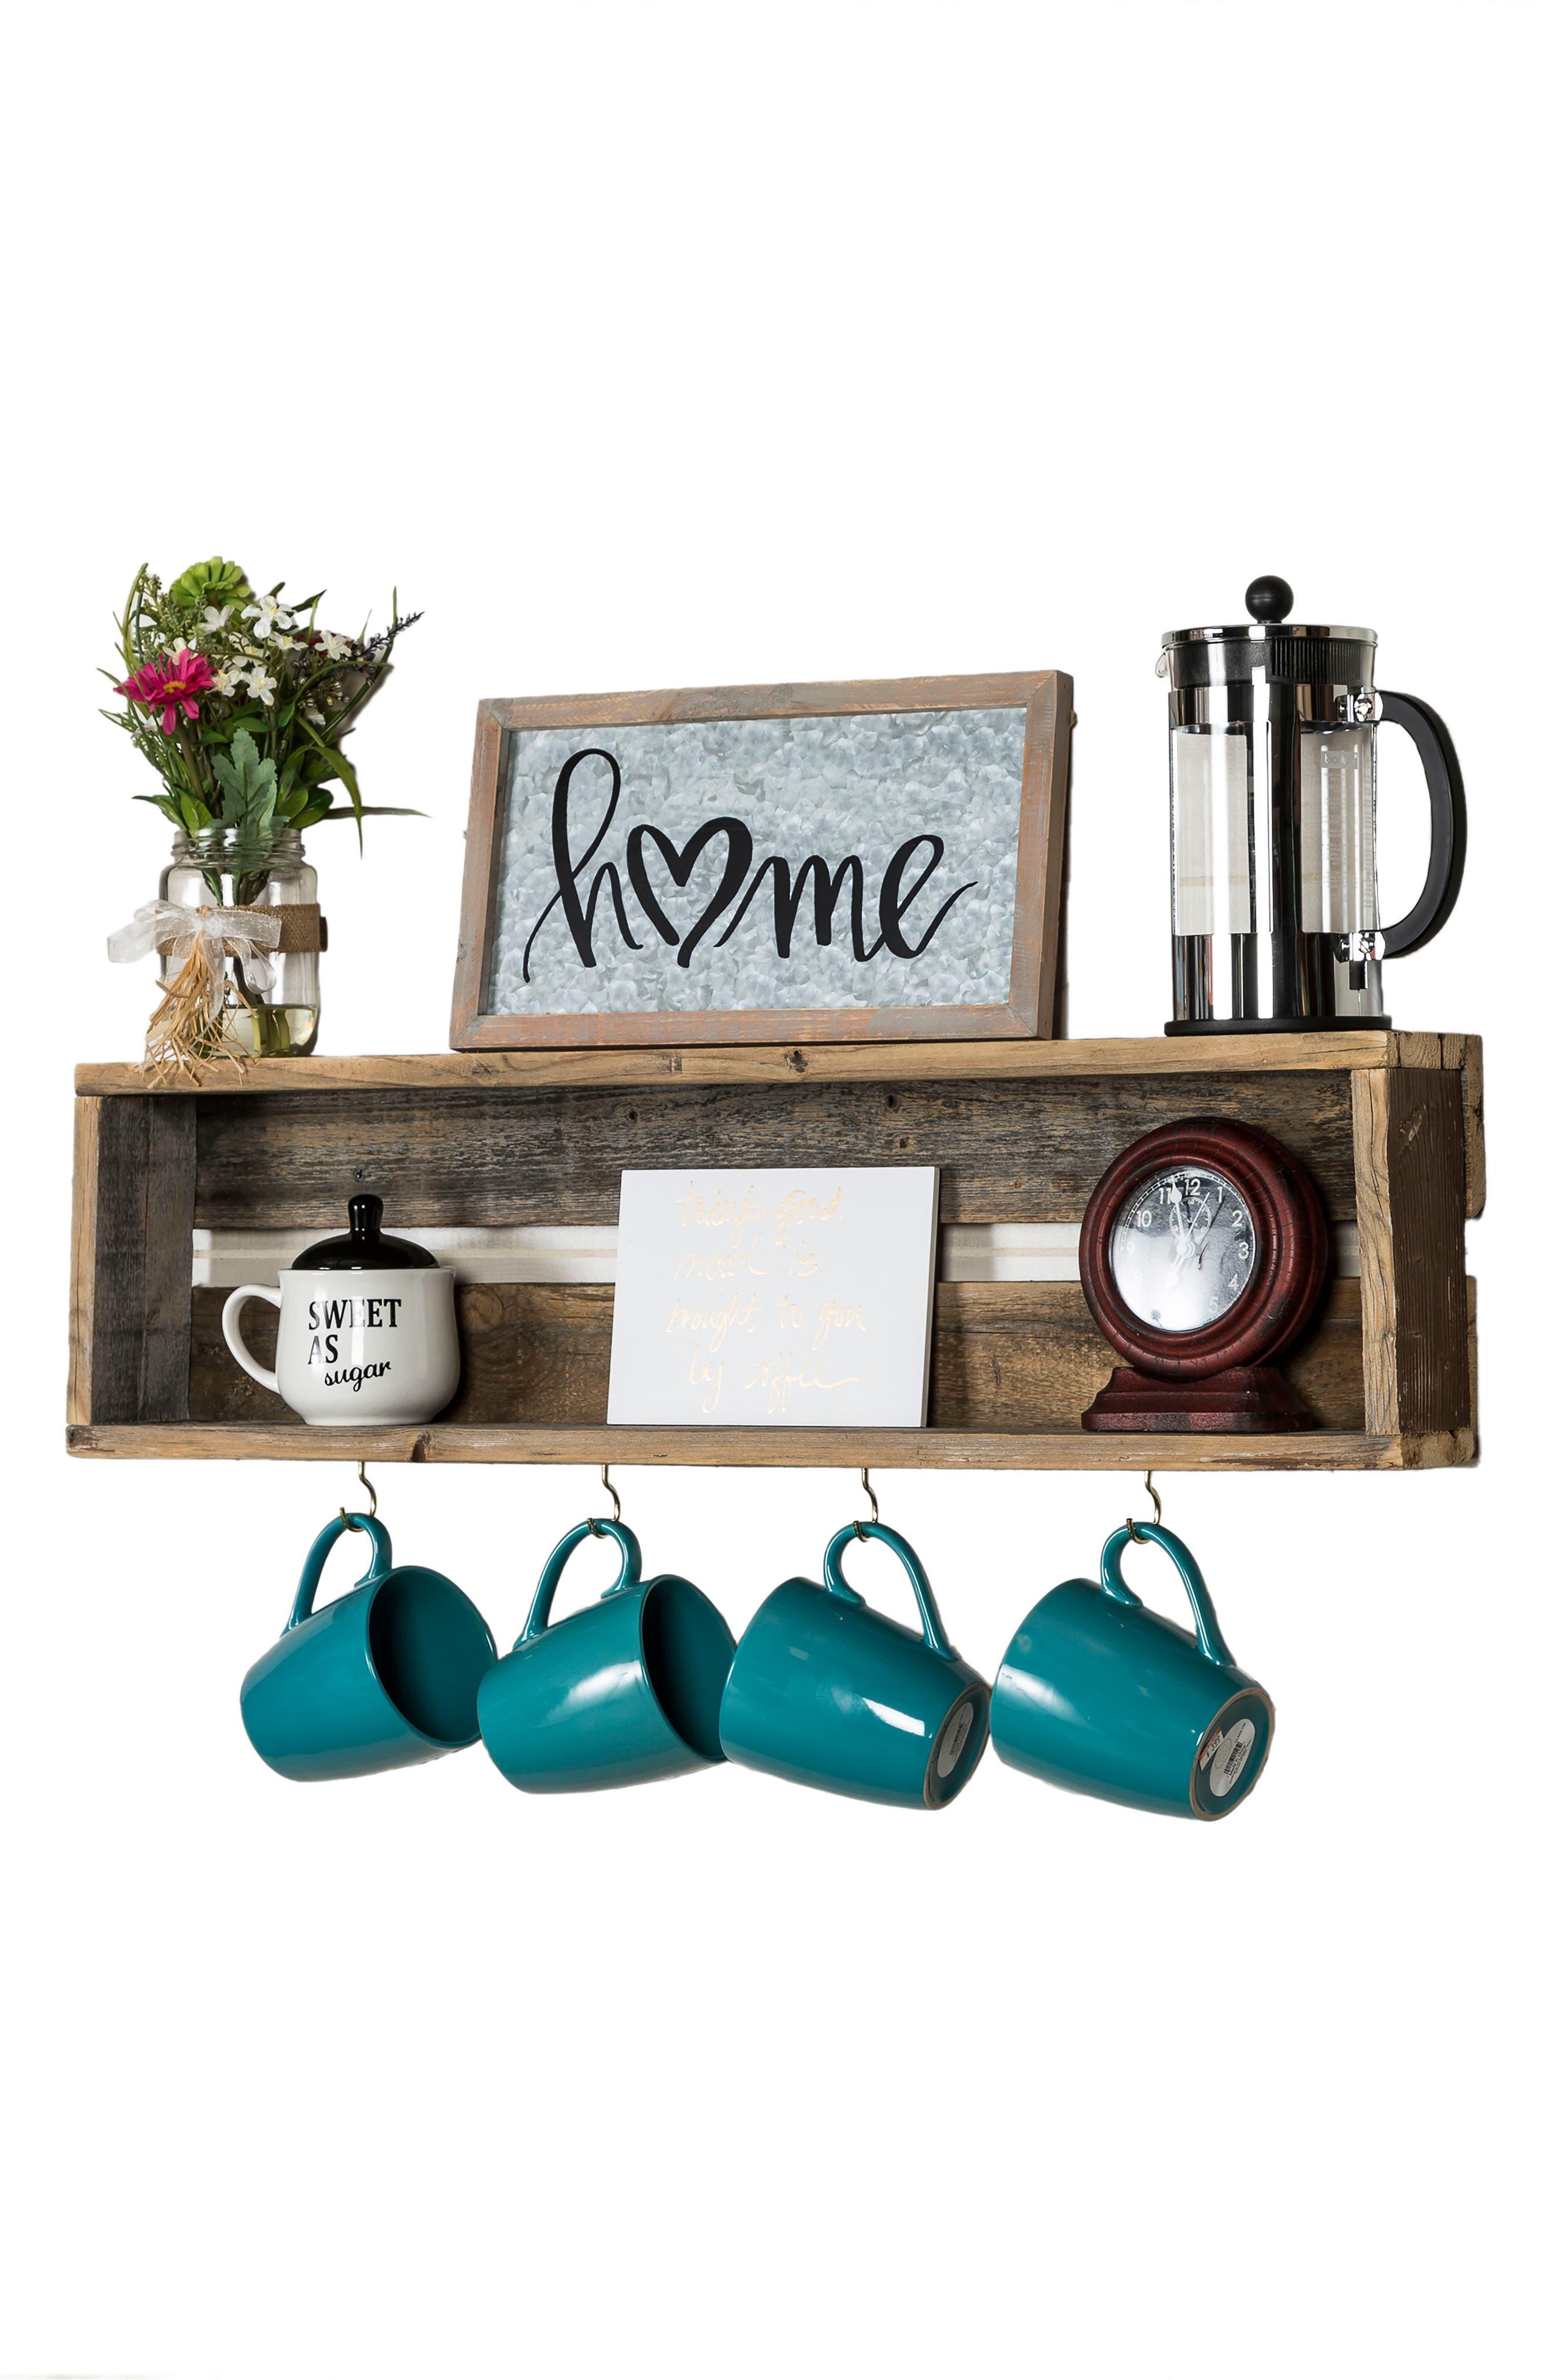 Repurposed Wood Shelf with Hooks,                             Alternate thumbnail 4, color,                             200